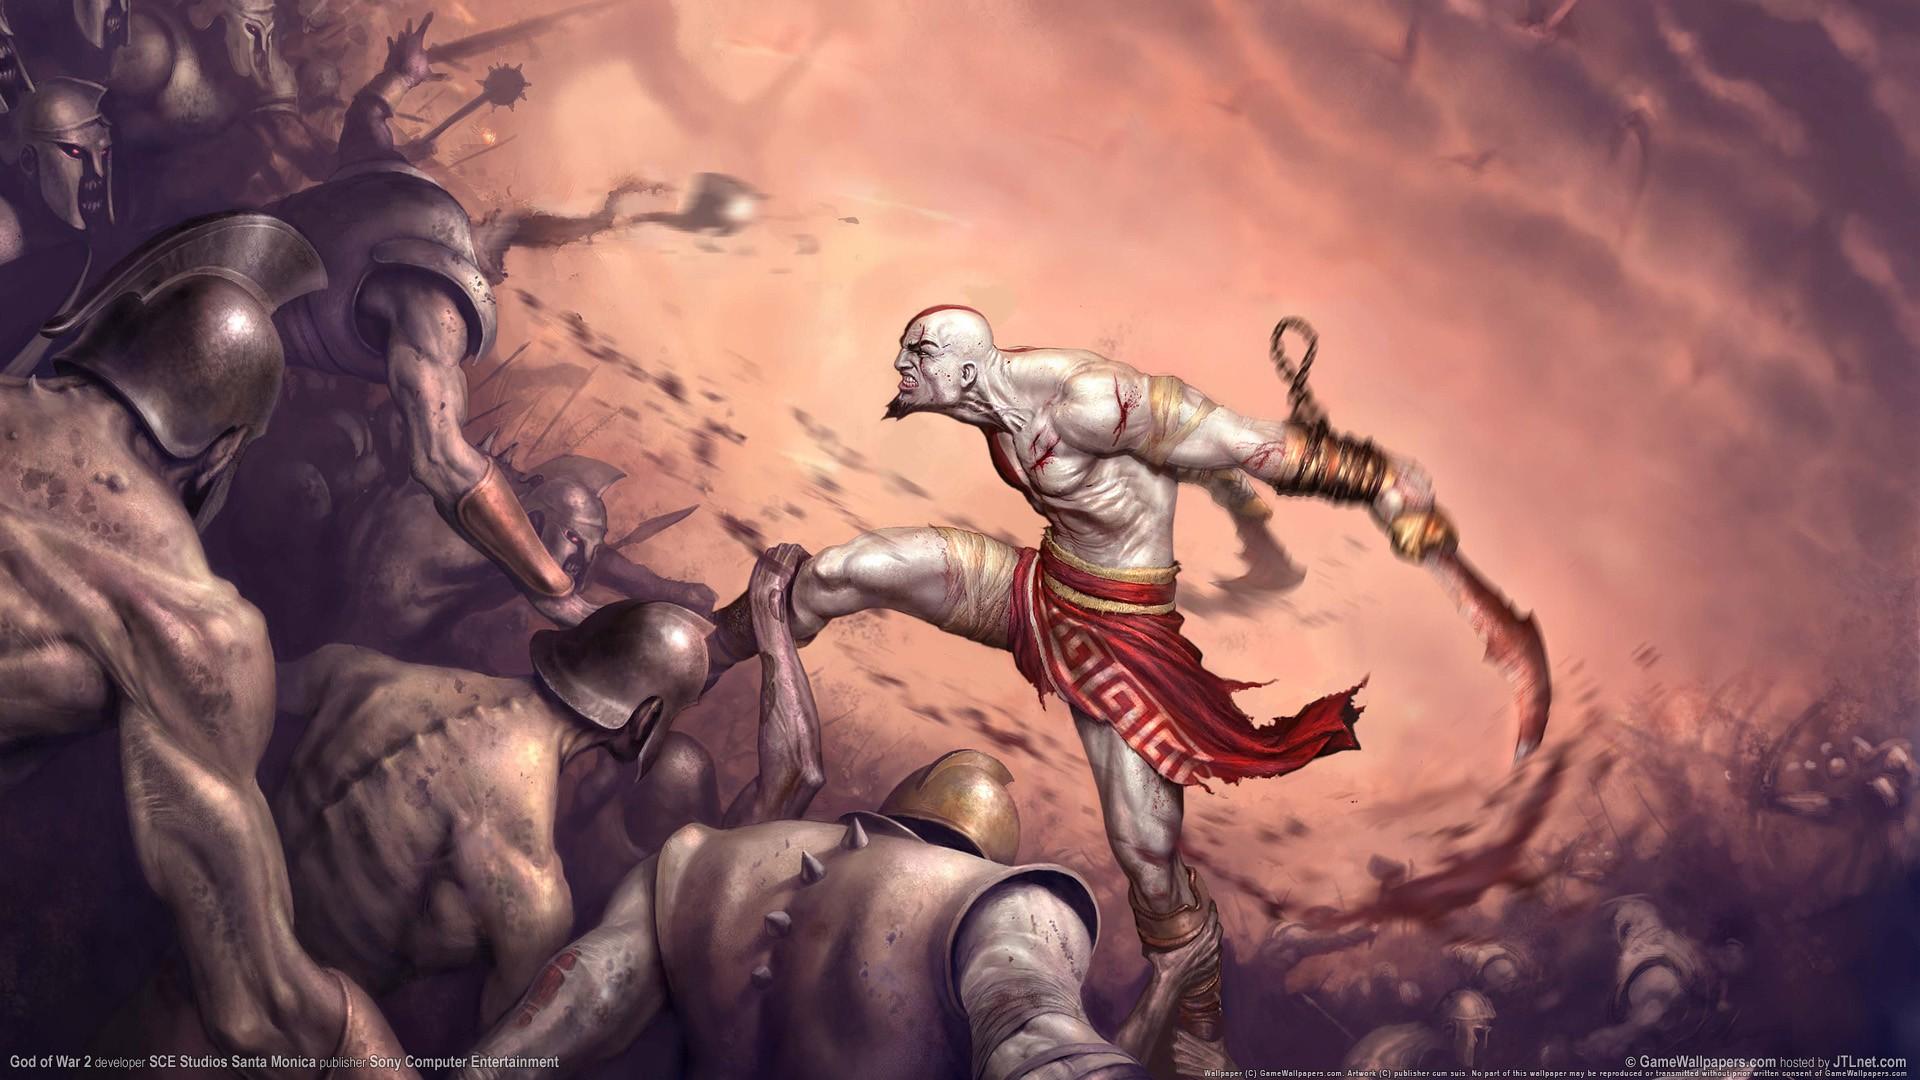 General 1920x1080 God of War God of War II video game art Kratos video games fantasy art Sony Computer Entertainment video game man